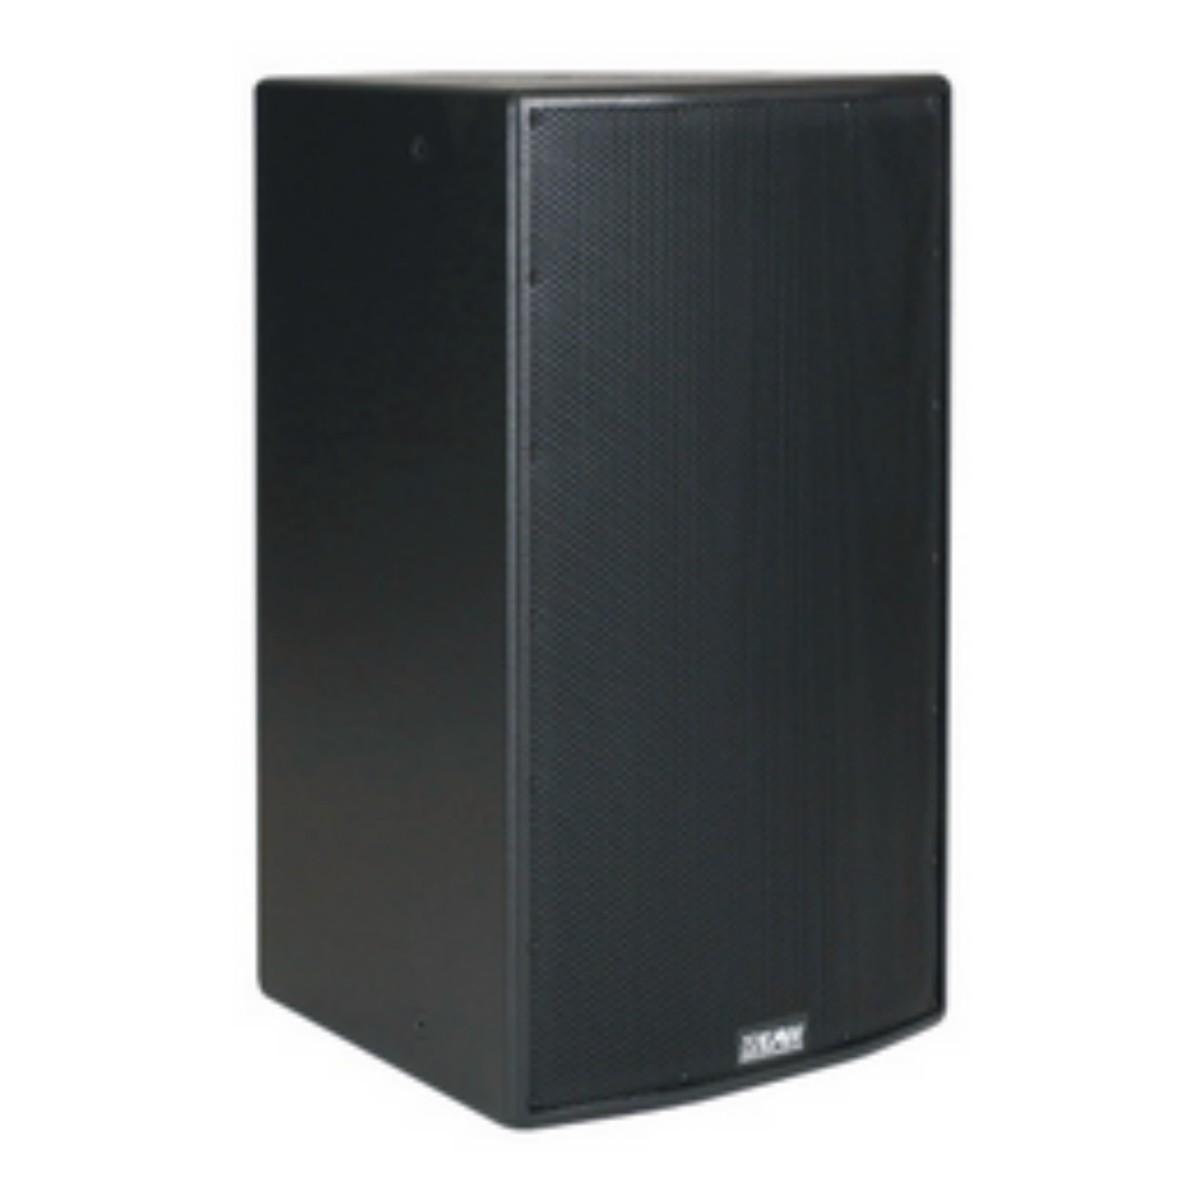 MK5396i 二分频高输出梯形音箱